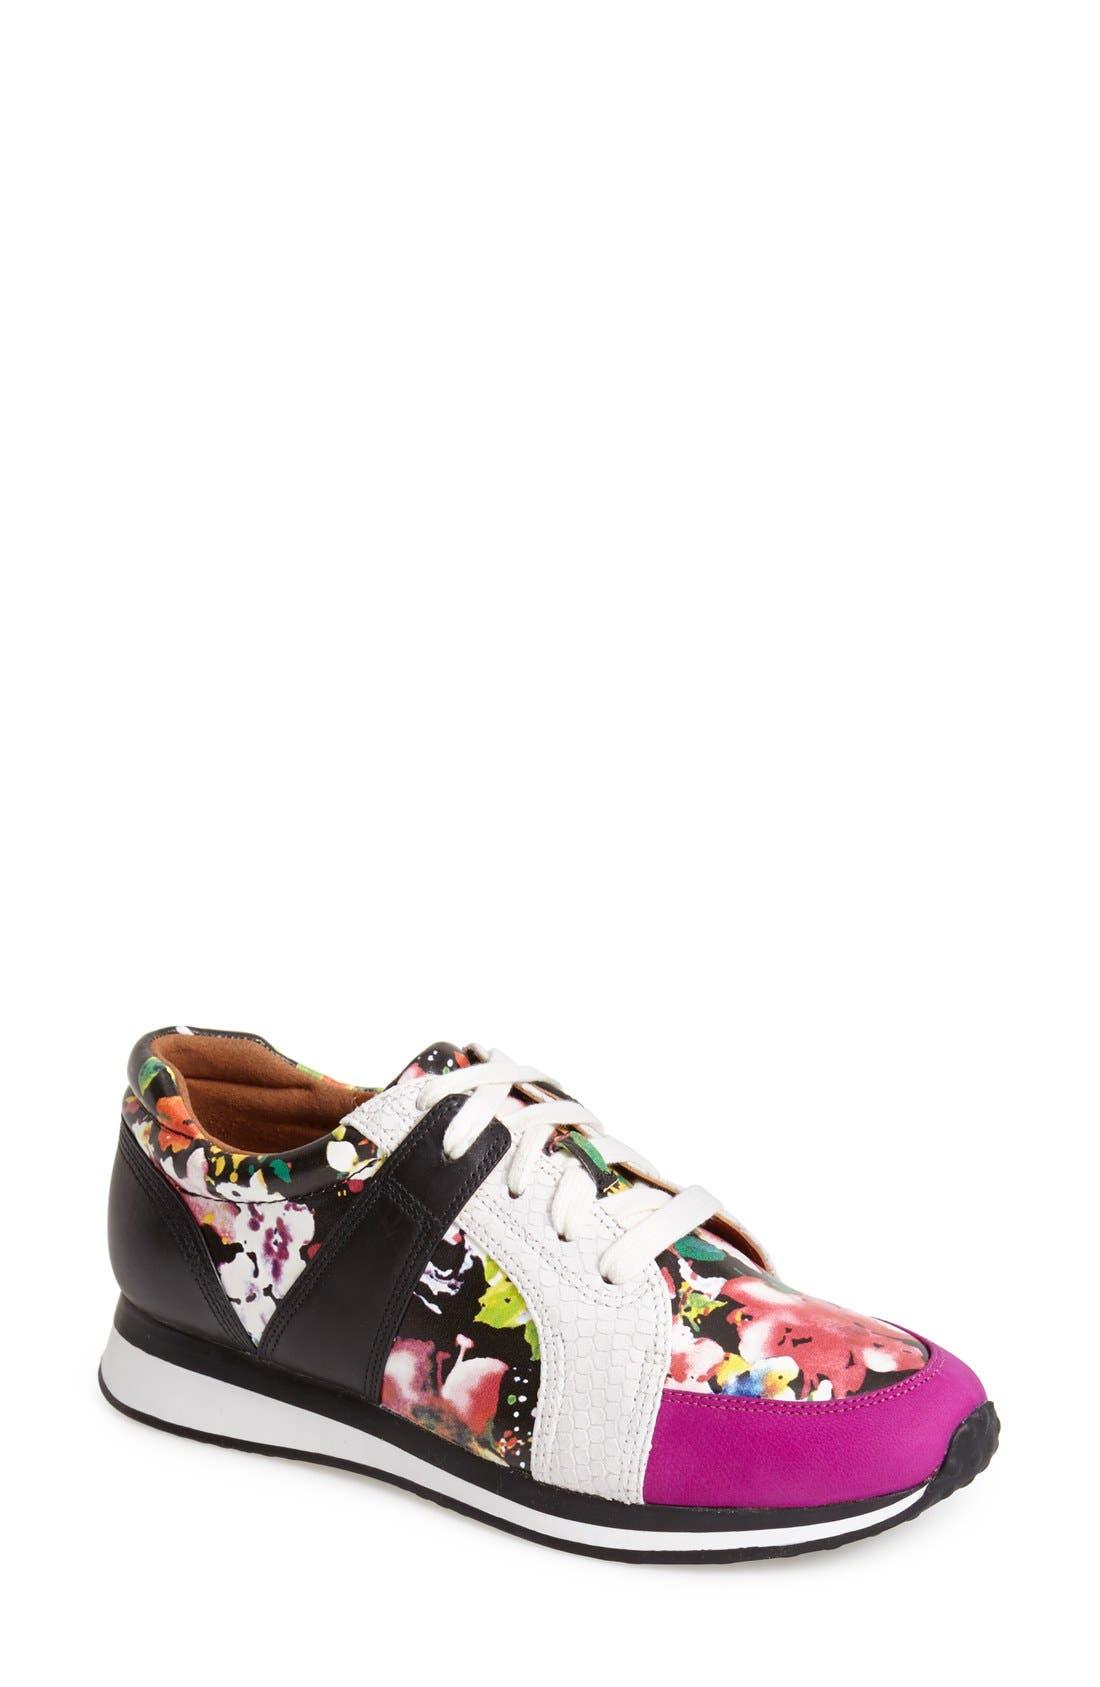 Alternate Image 1 Selected - Enzo Angiolini 'Reeber' Sneaker (Women)